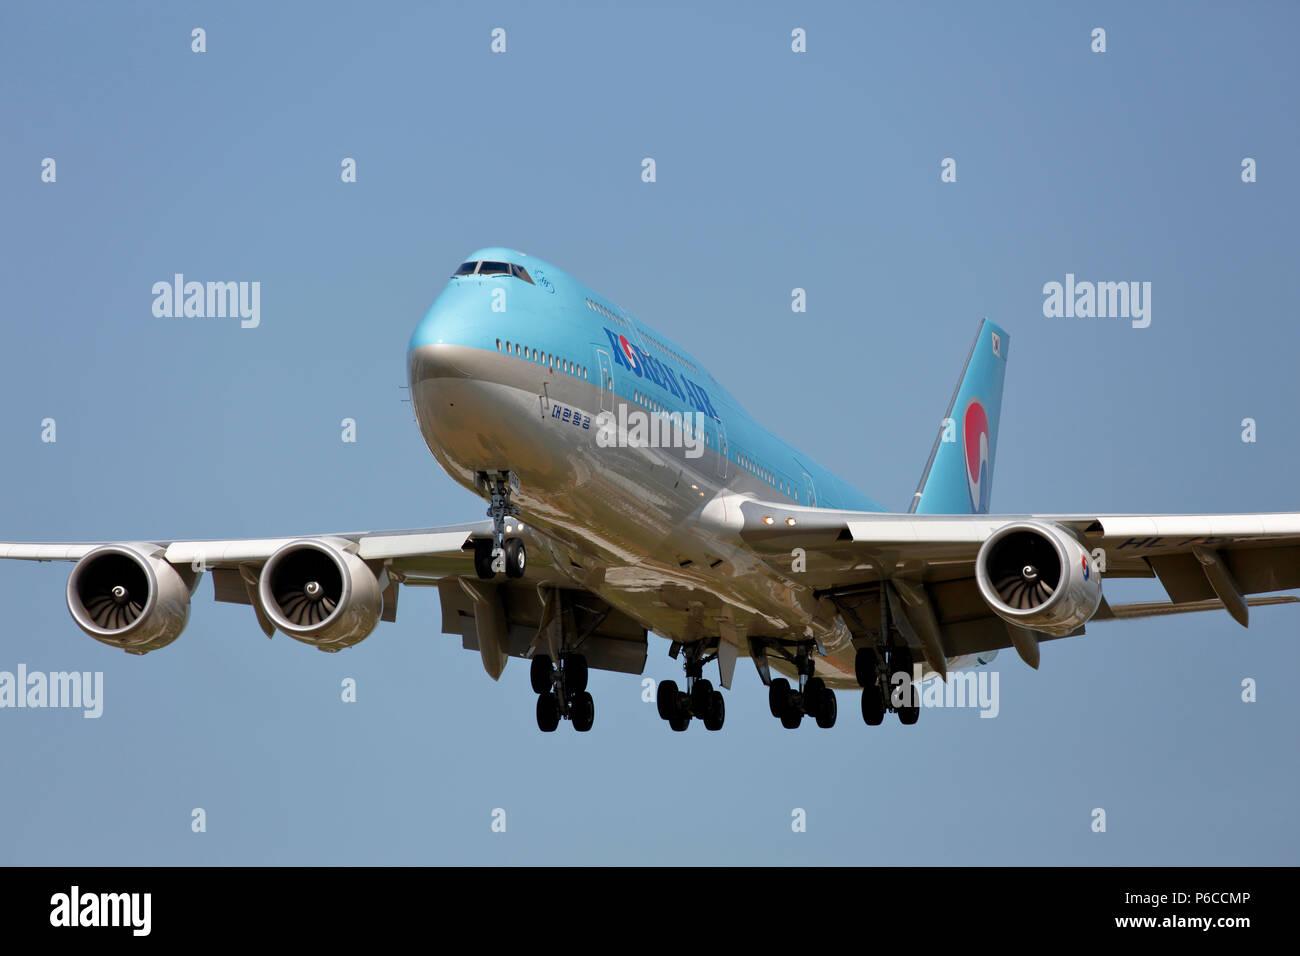 HL7643 Korean Air Lines Boeing 747-8 arriving at London Heathrow airport on runway 27L - Stock Image